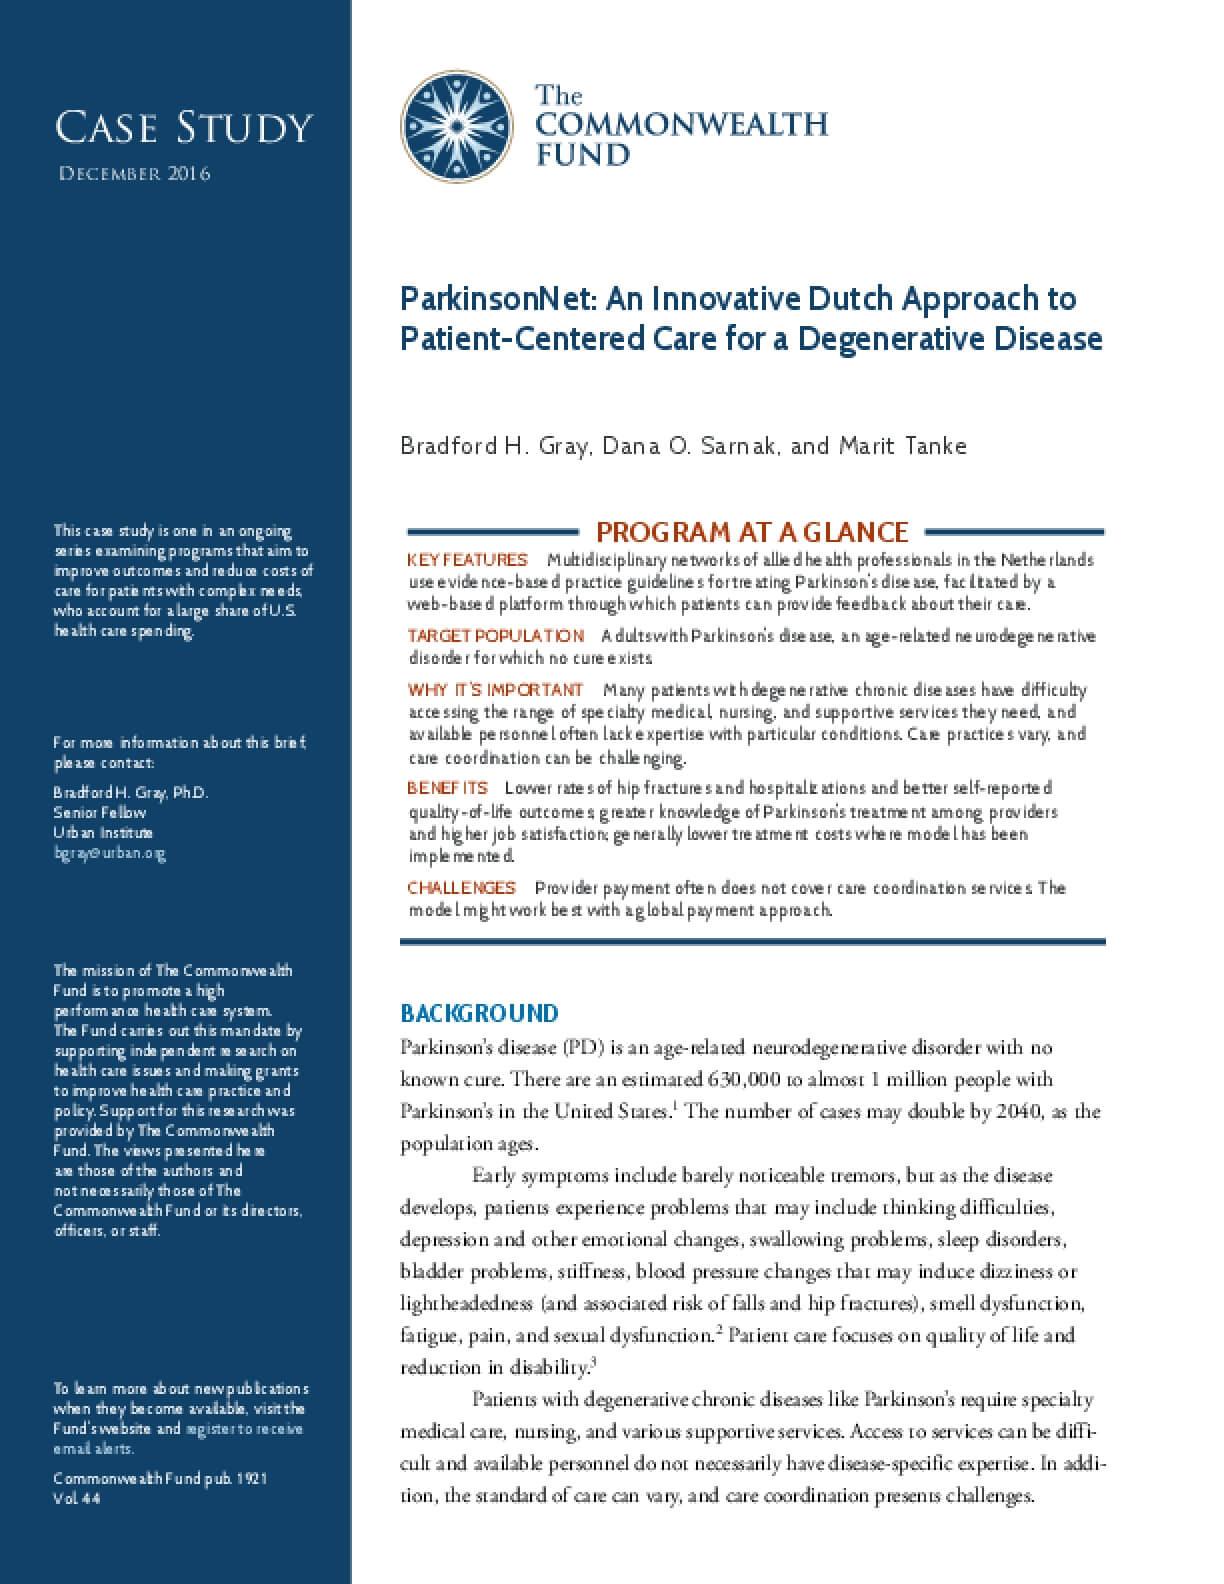 ParkinsonNet: An Innovative Dutch Approach to Patient-Centered Care for a Degenerative Disease